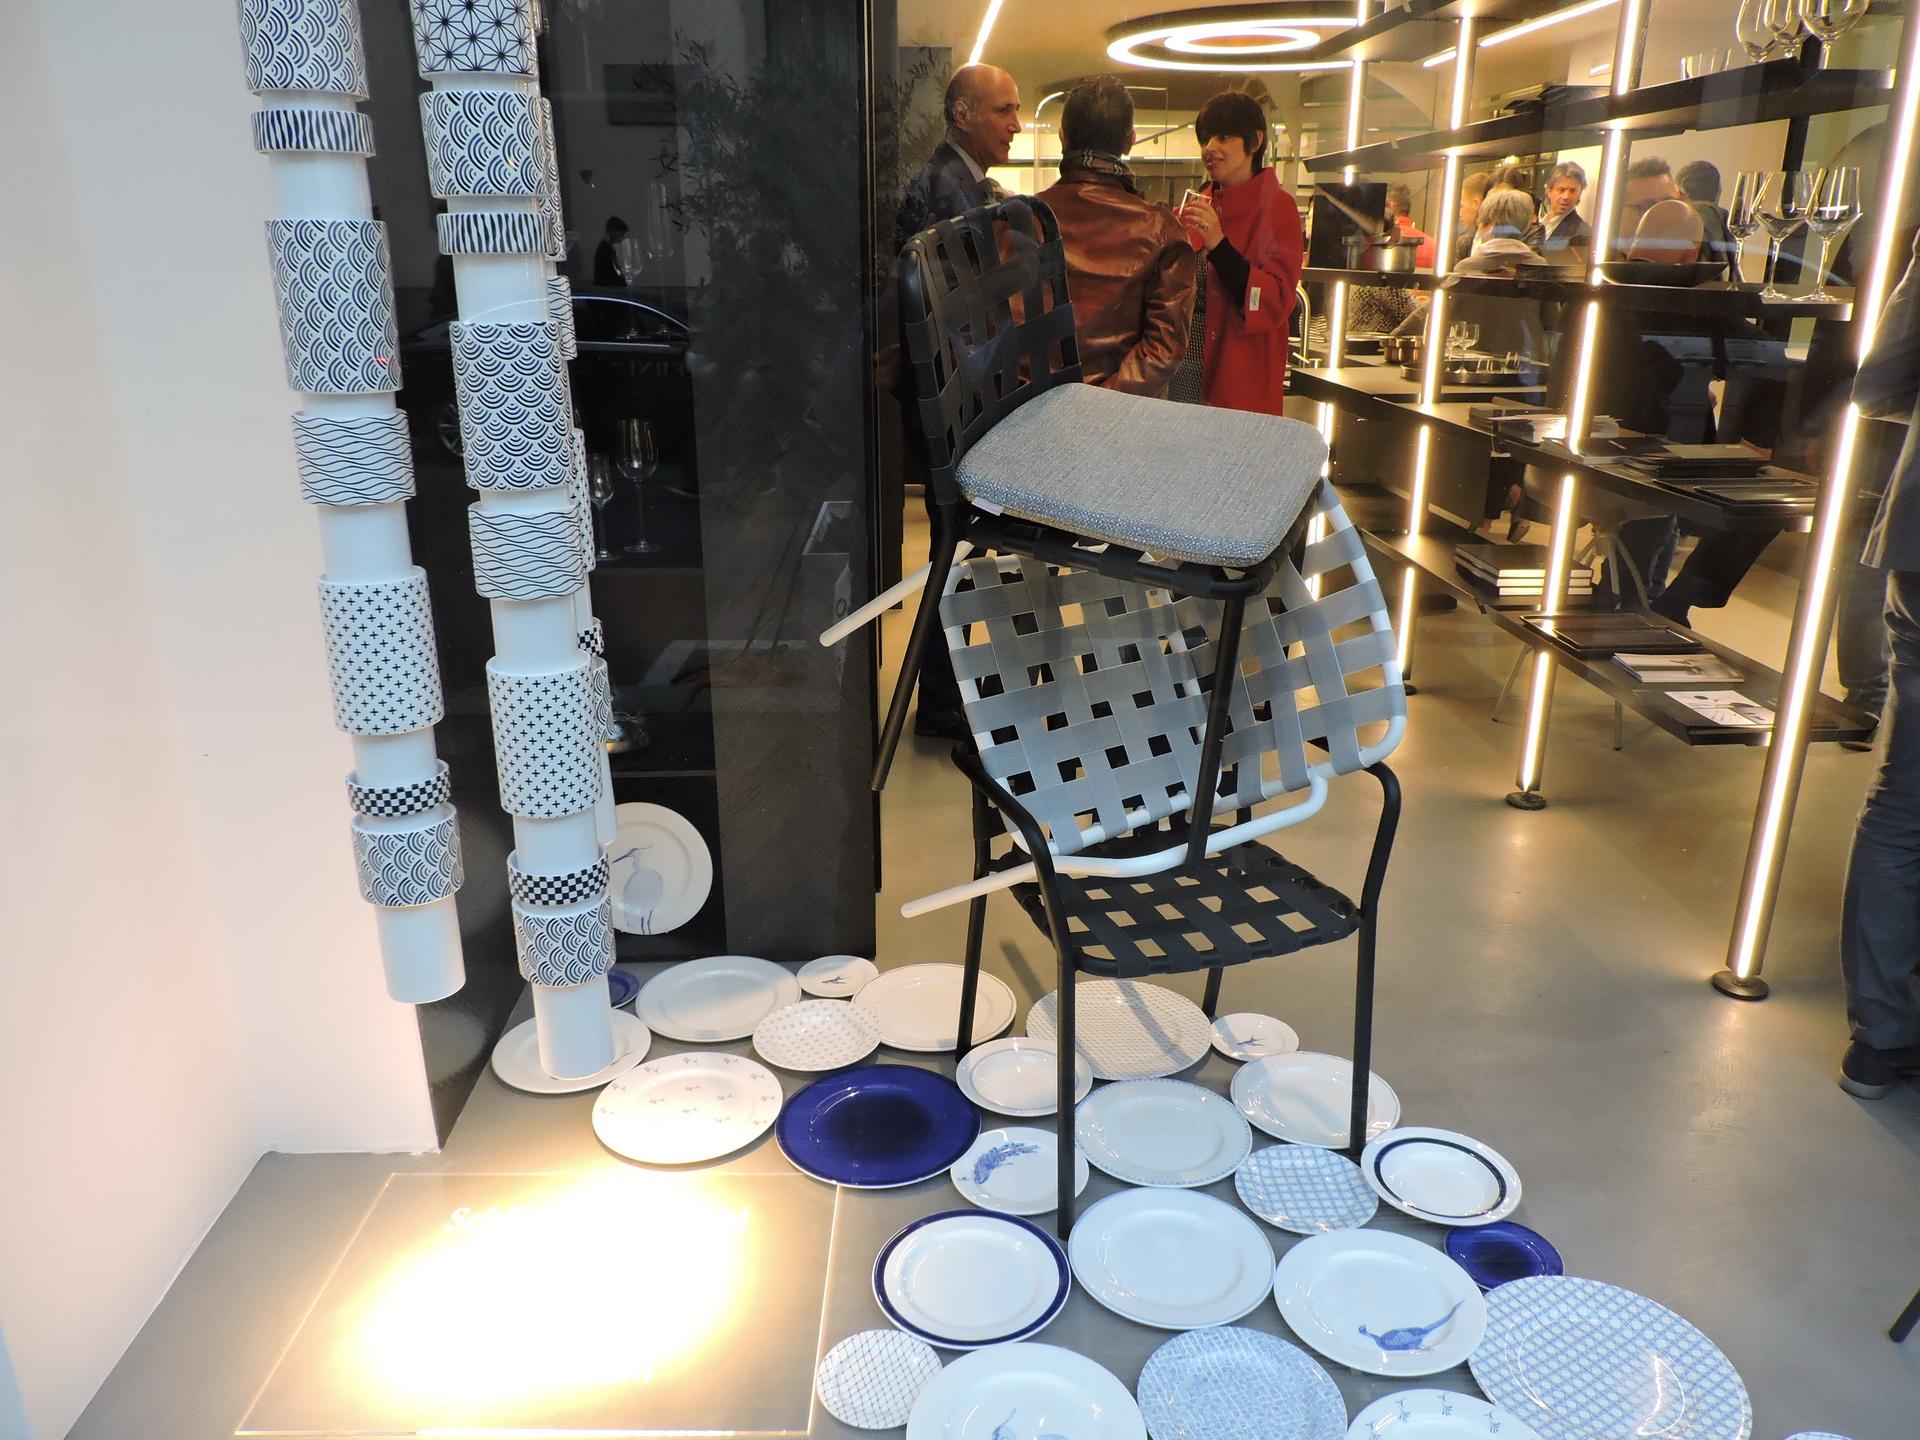 Fuorisalone 2017 - Desing Week 2017 - Binova Milano - cocktail con Davide Oldani e Schonhuber Franchi 008